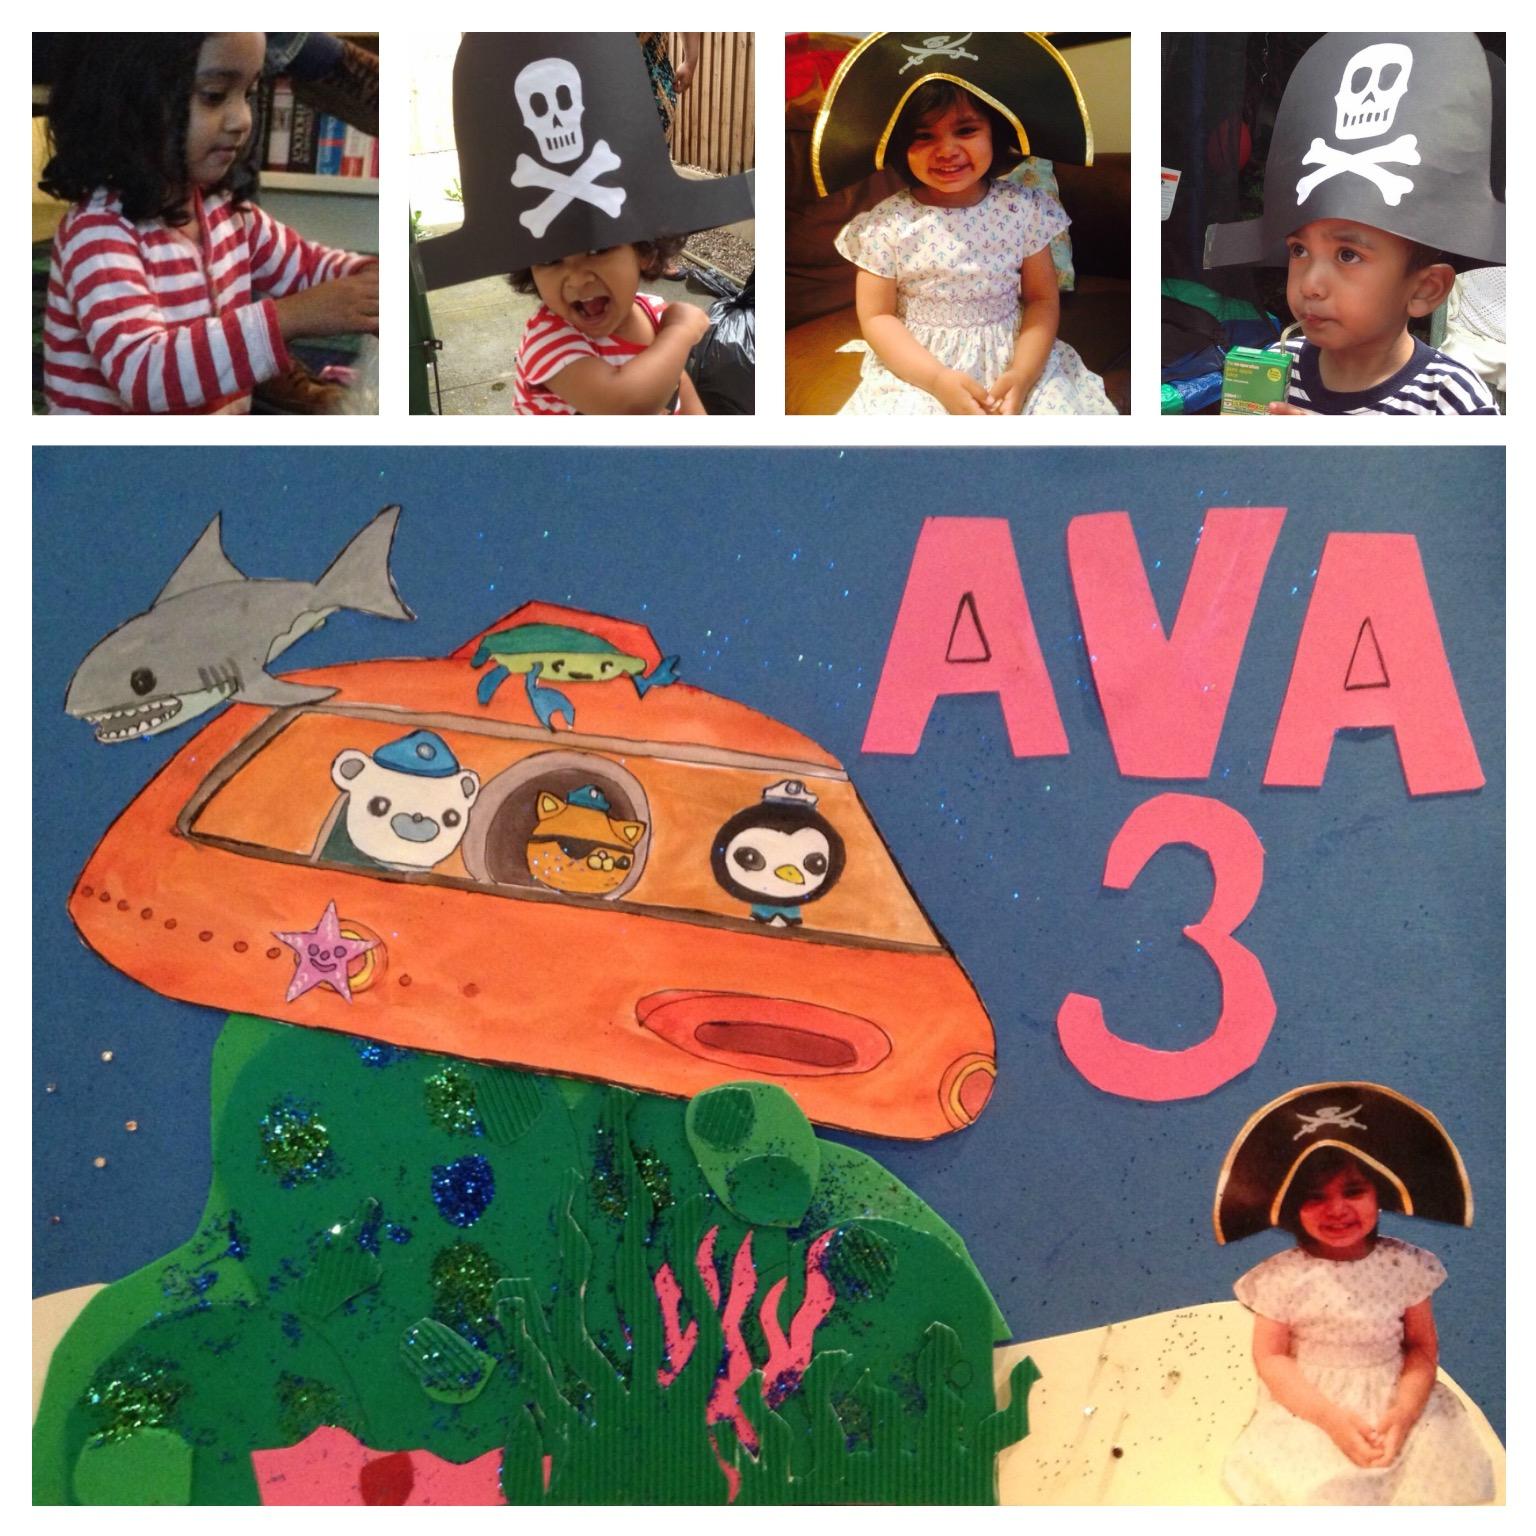 Ava third birthday